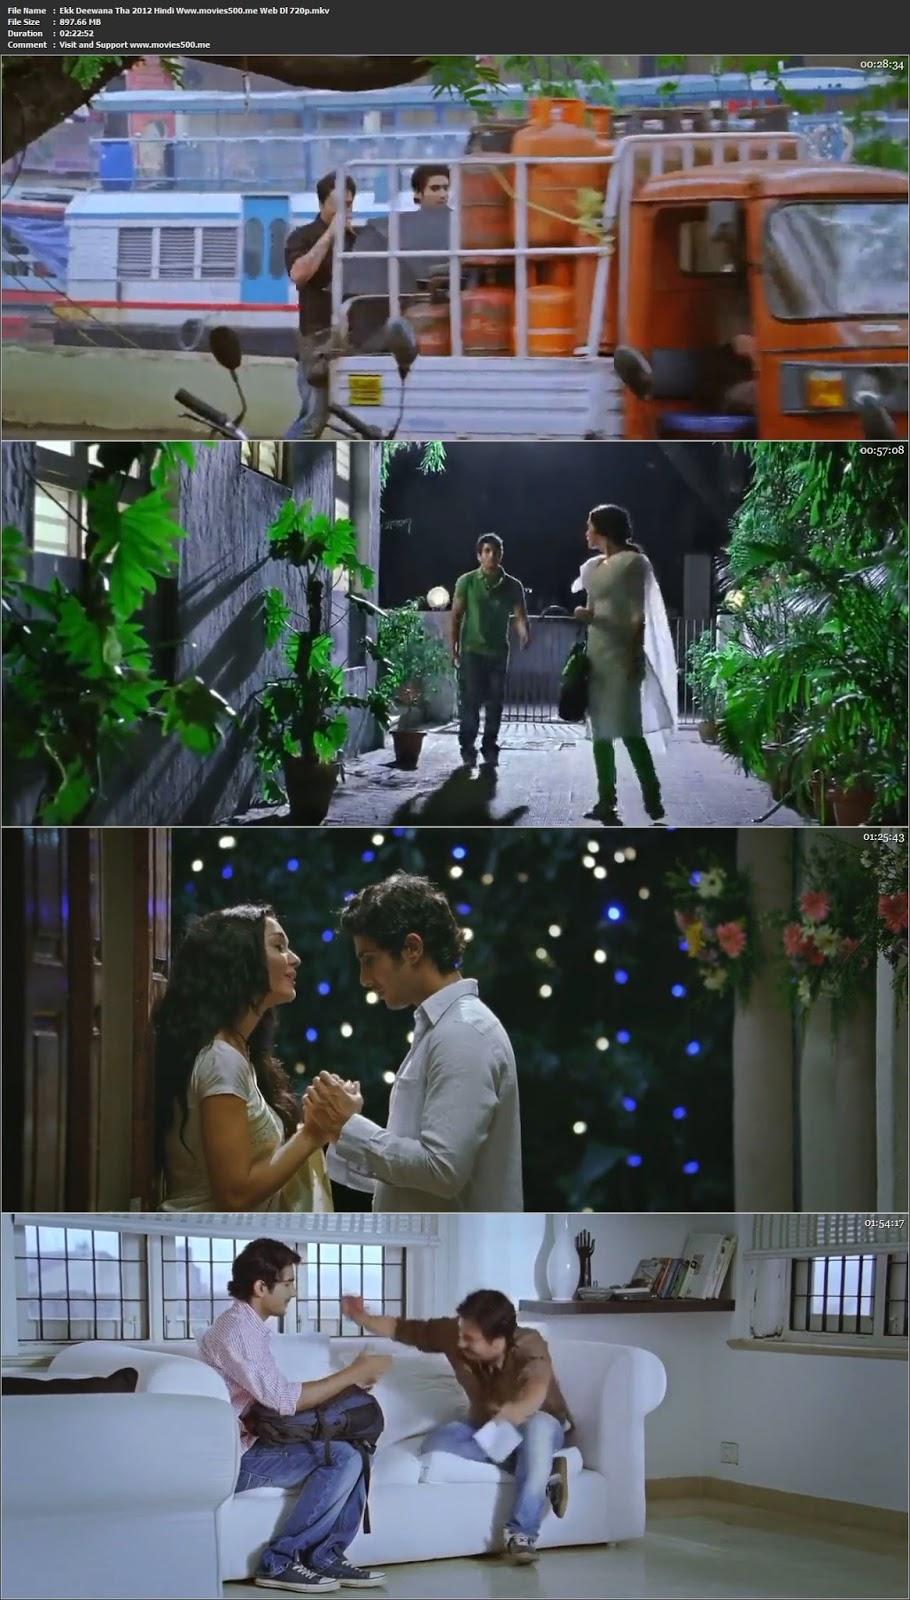 Ekk Deewana Tha 2012 Hindi 900MB WEB DL 720p at movies500.site